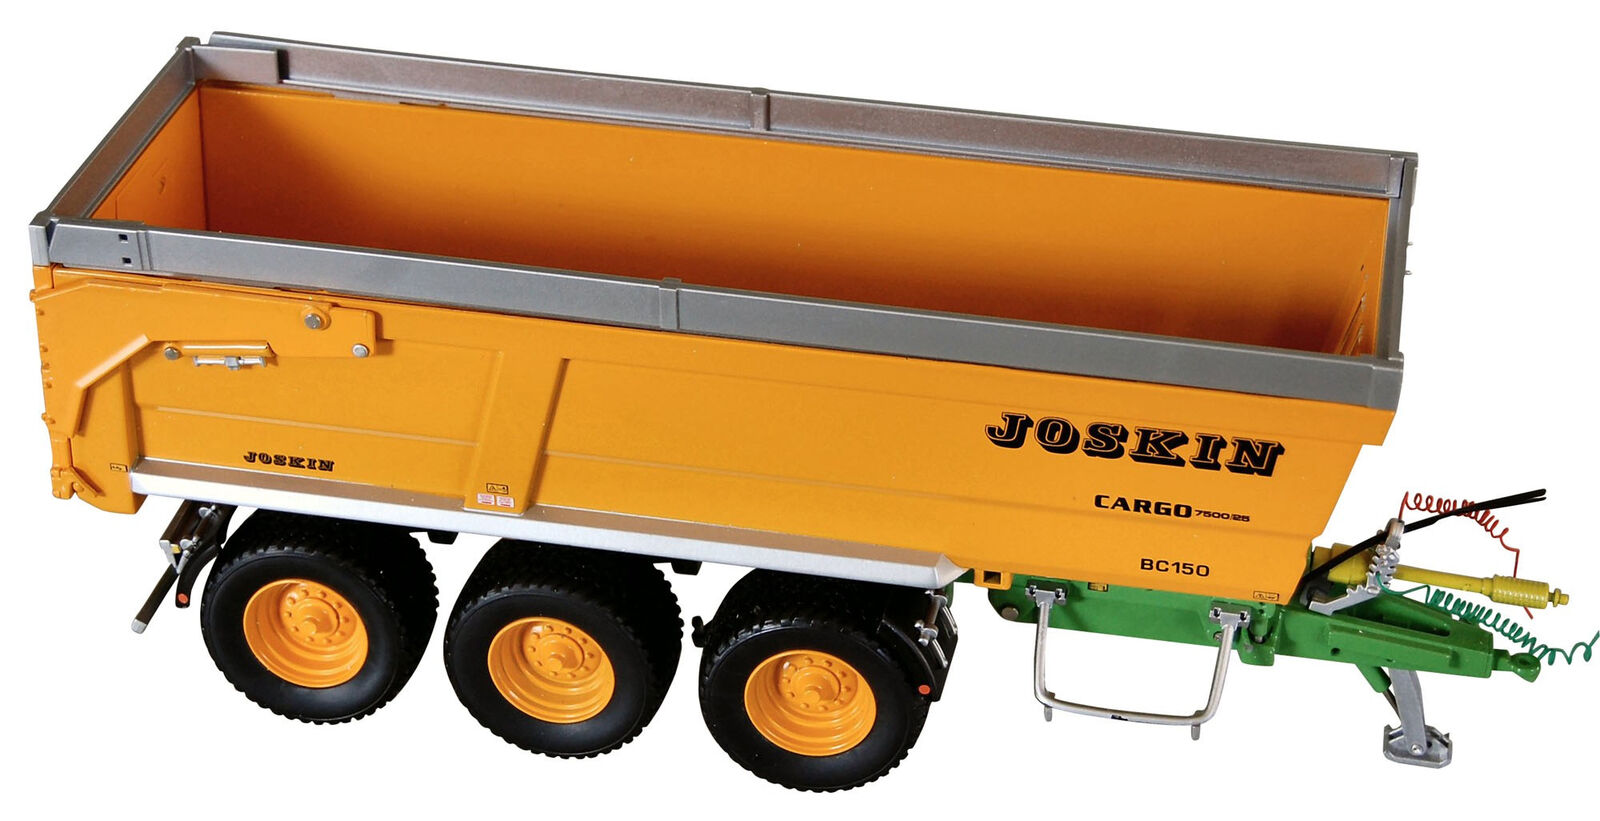 ventas en linea ROS60201.4 - Benne Benne Benne 3 essieux JOSKIN Cochego  - 1 32  marcas de moda